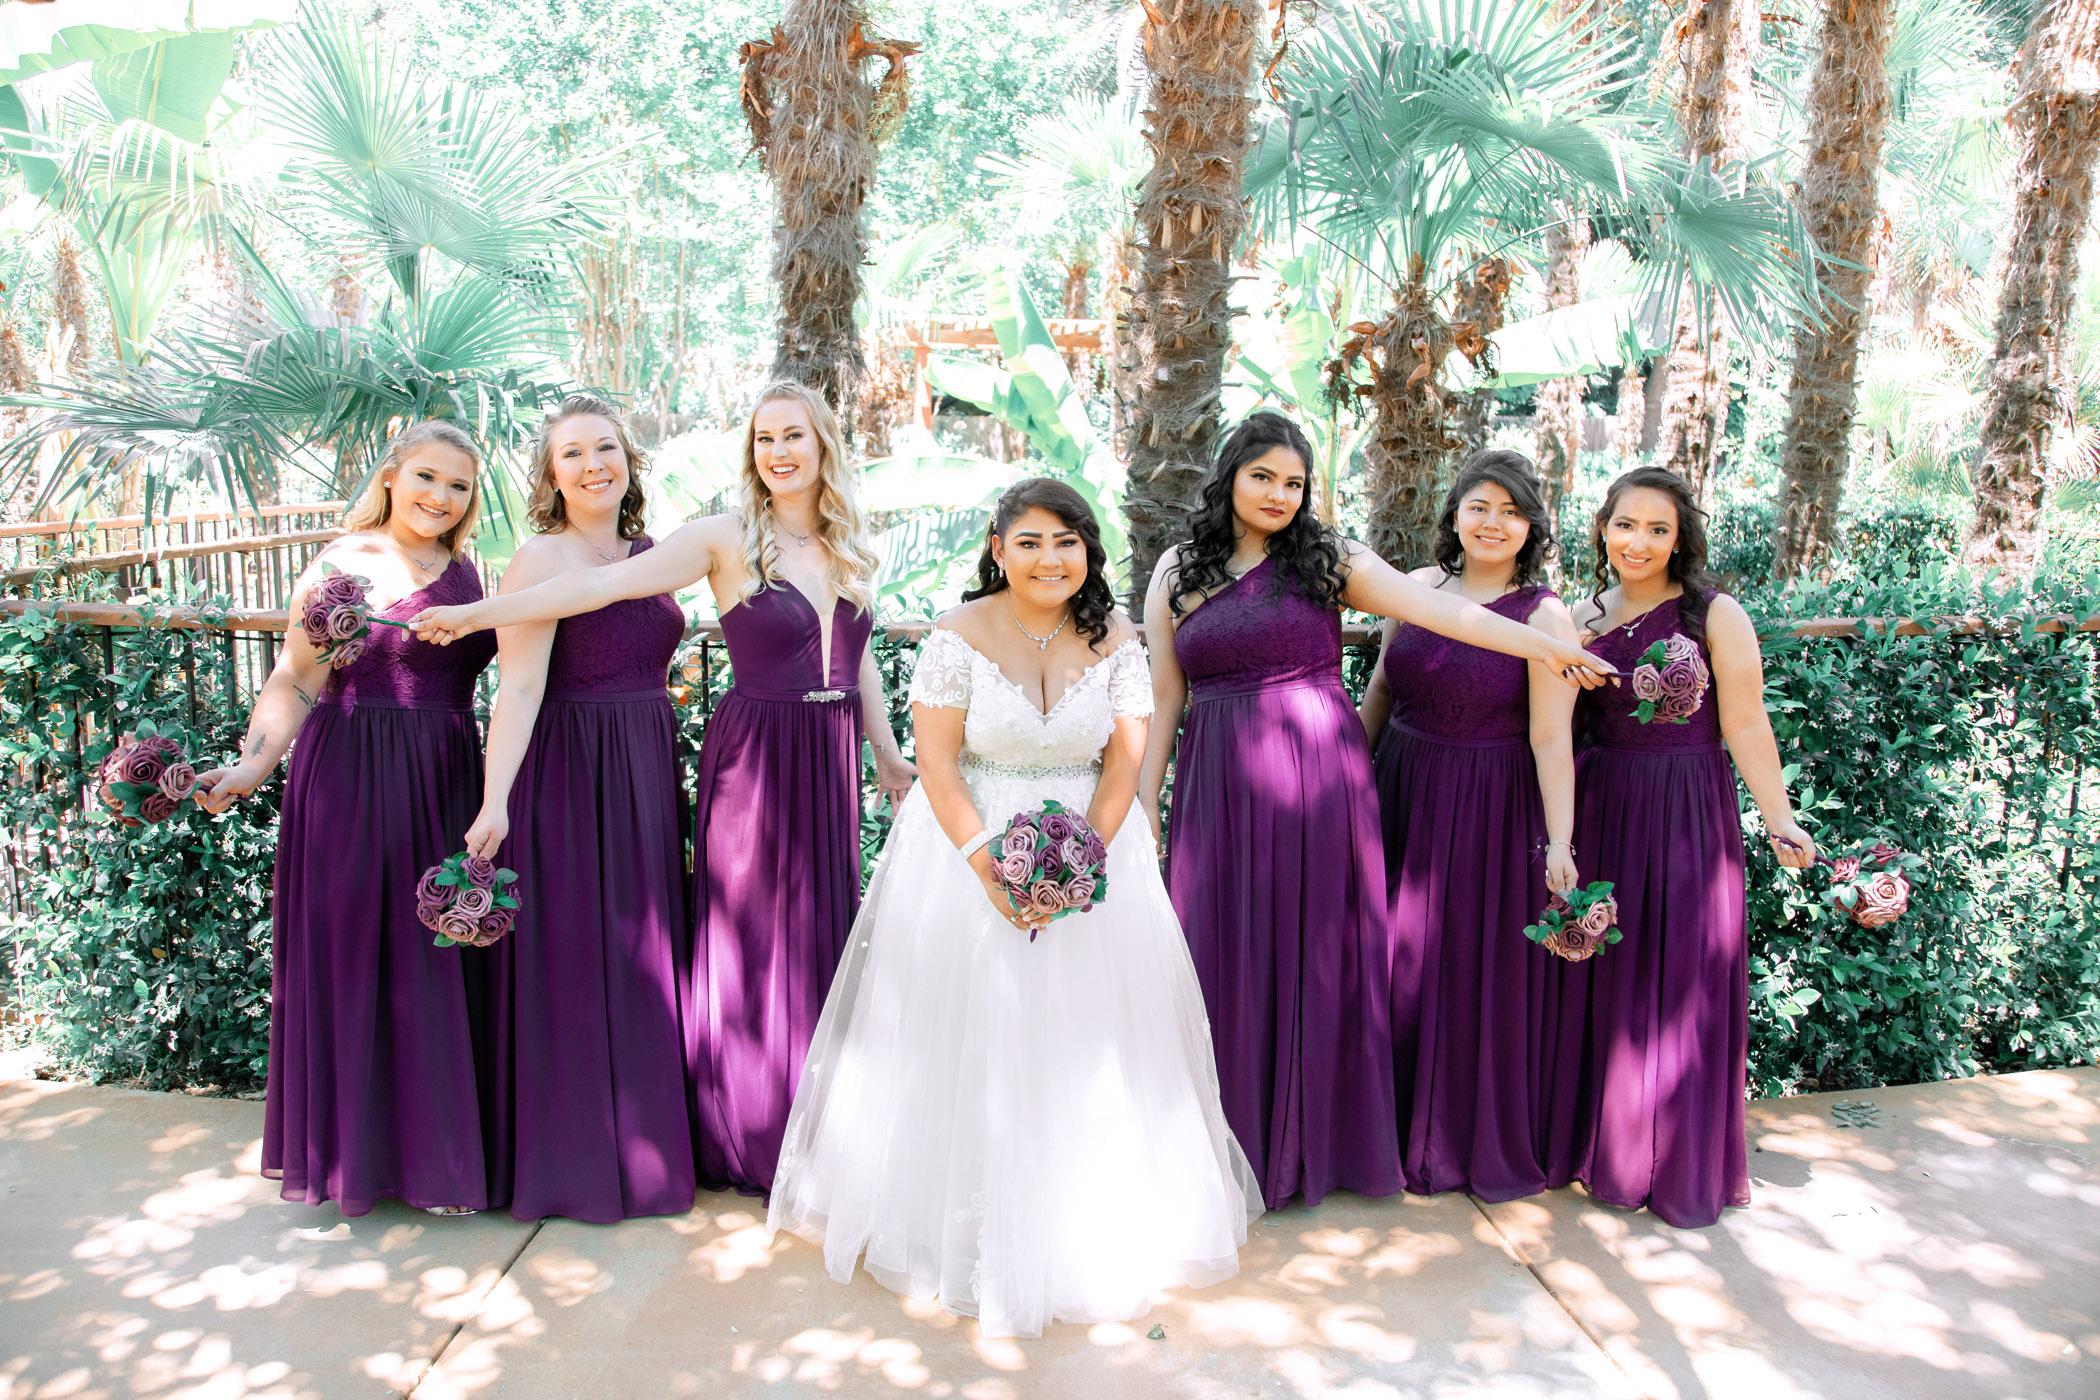 The Palms Hotel Chico Wedding Photos_3.jpg